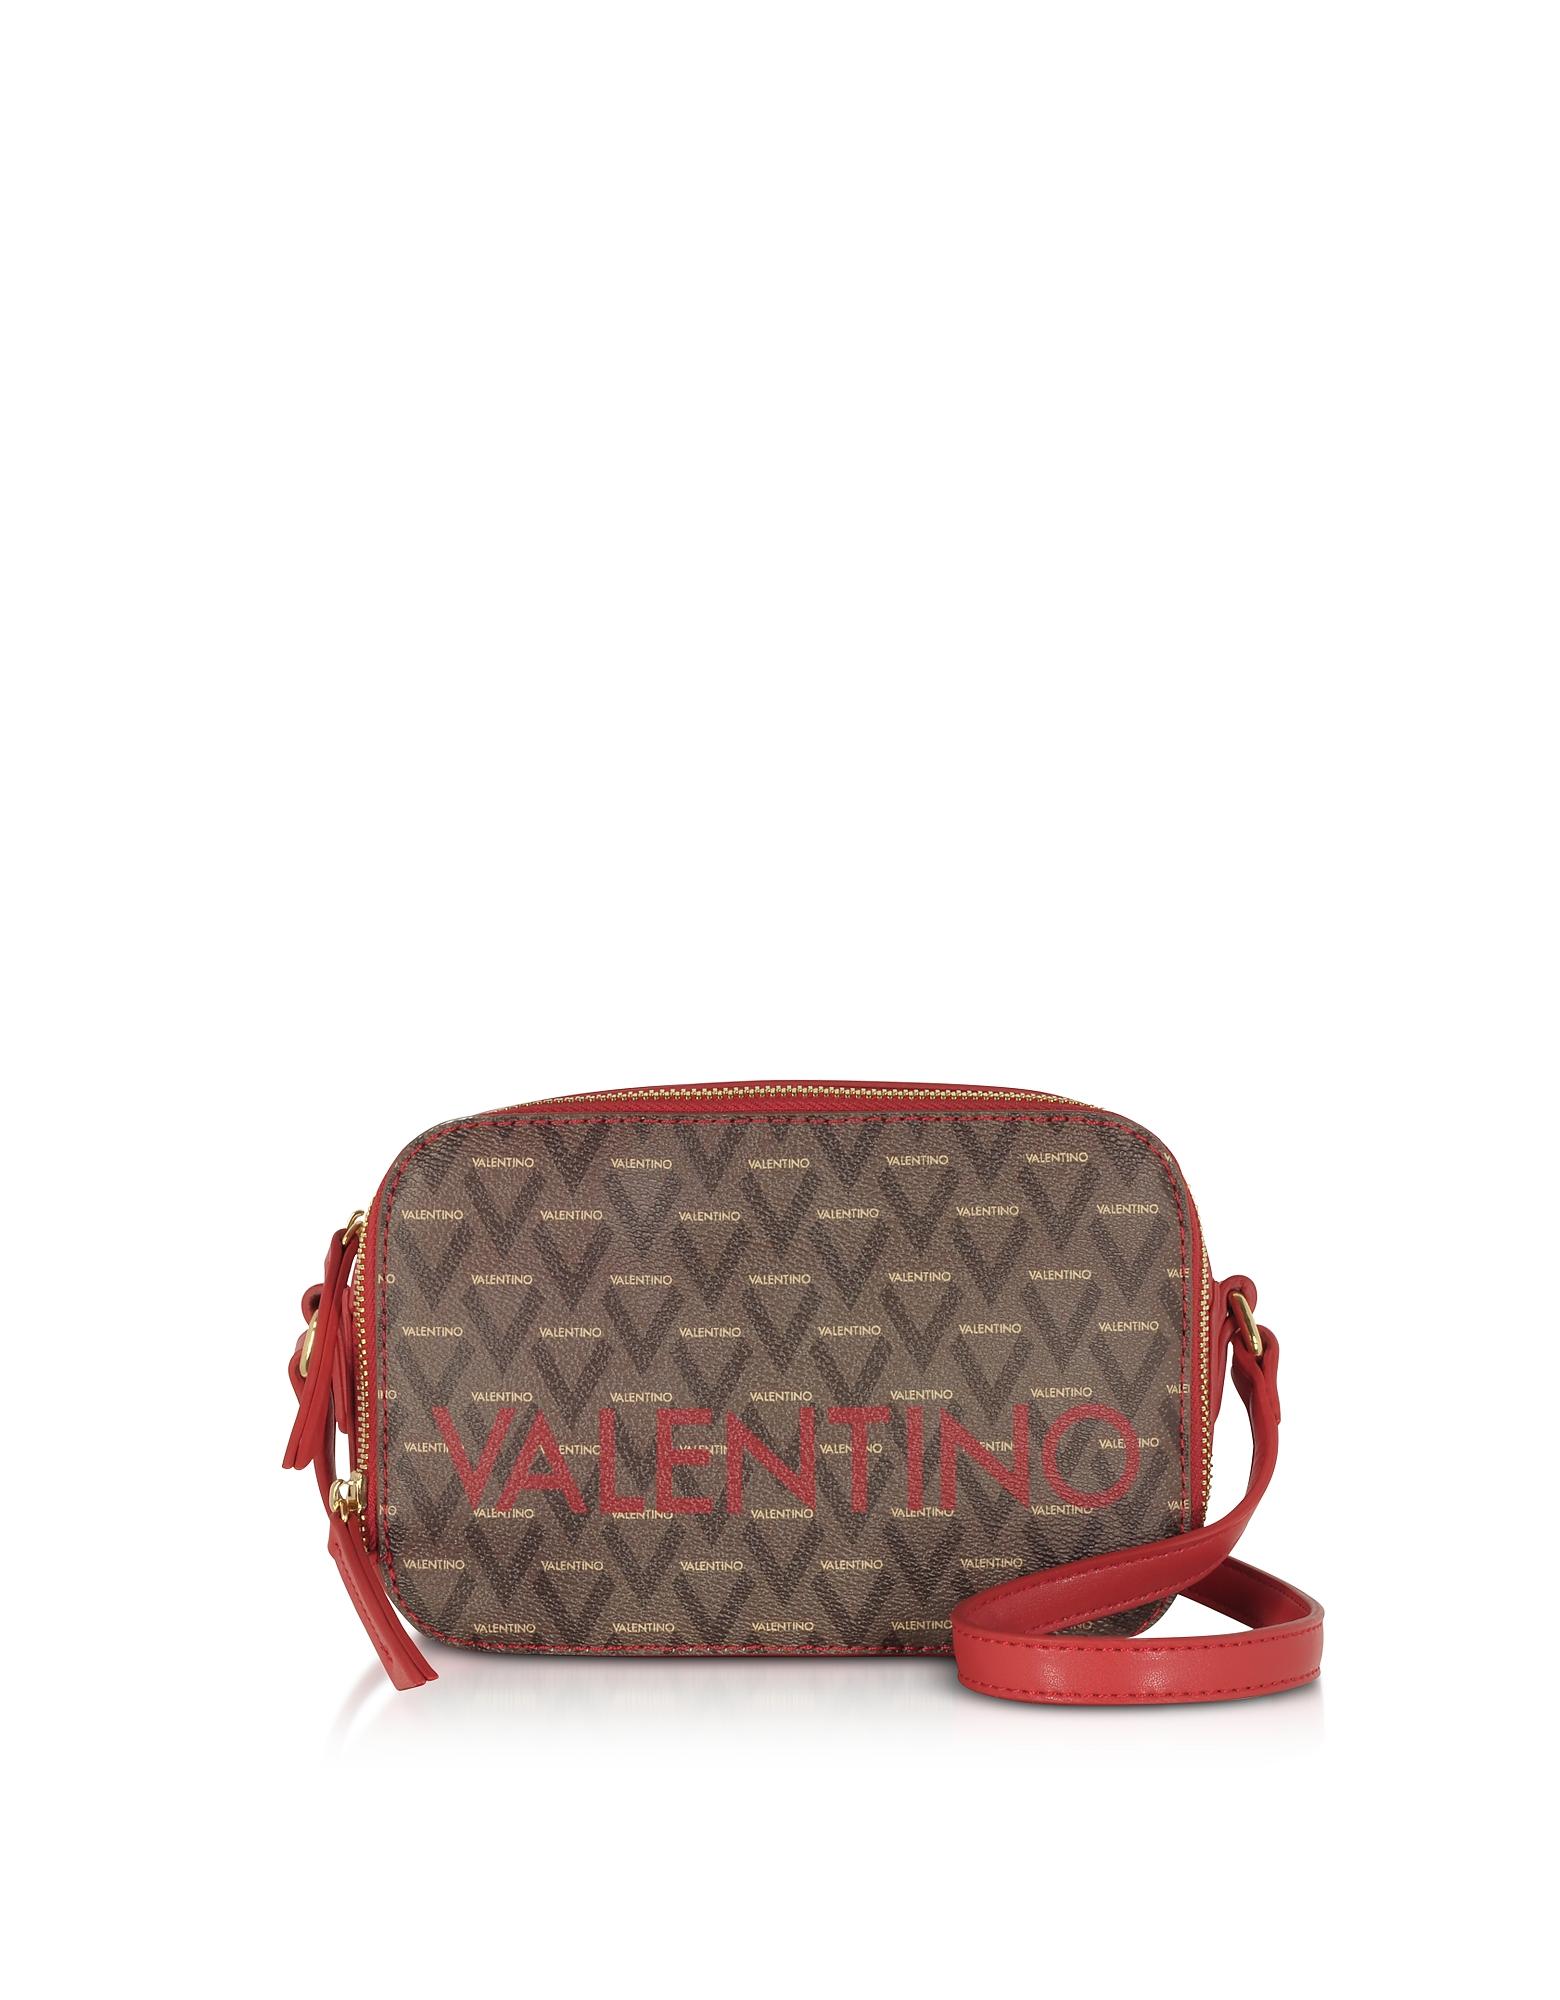 Valentino by Mario Valentino Designer Handbags, Liuto Signature Eco Leather Camera Bag